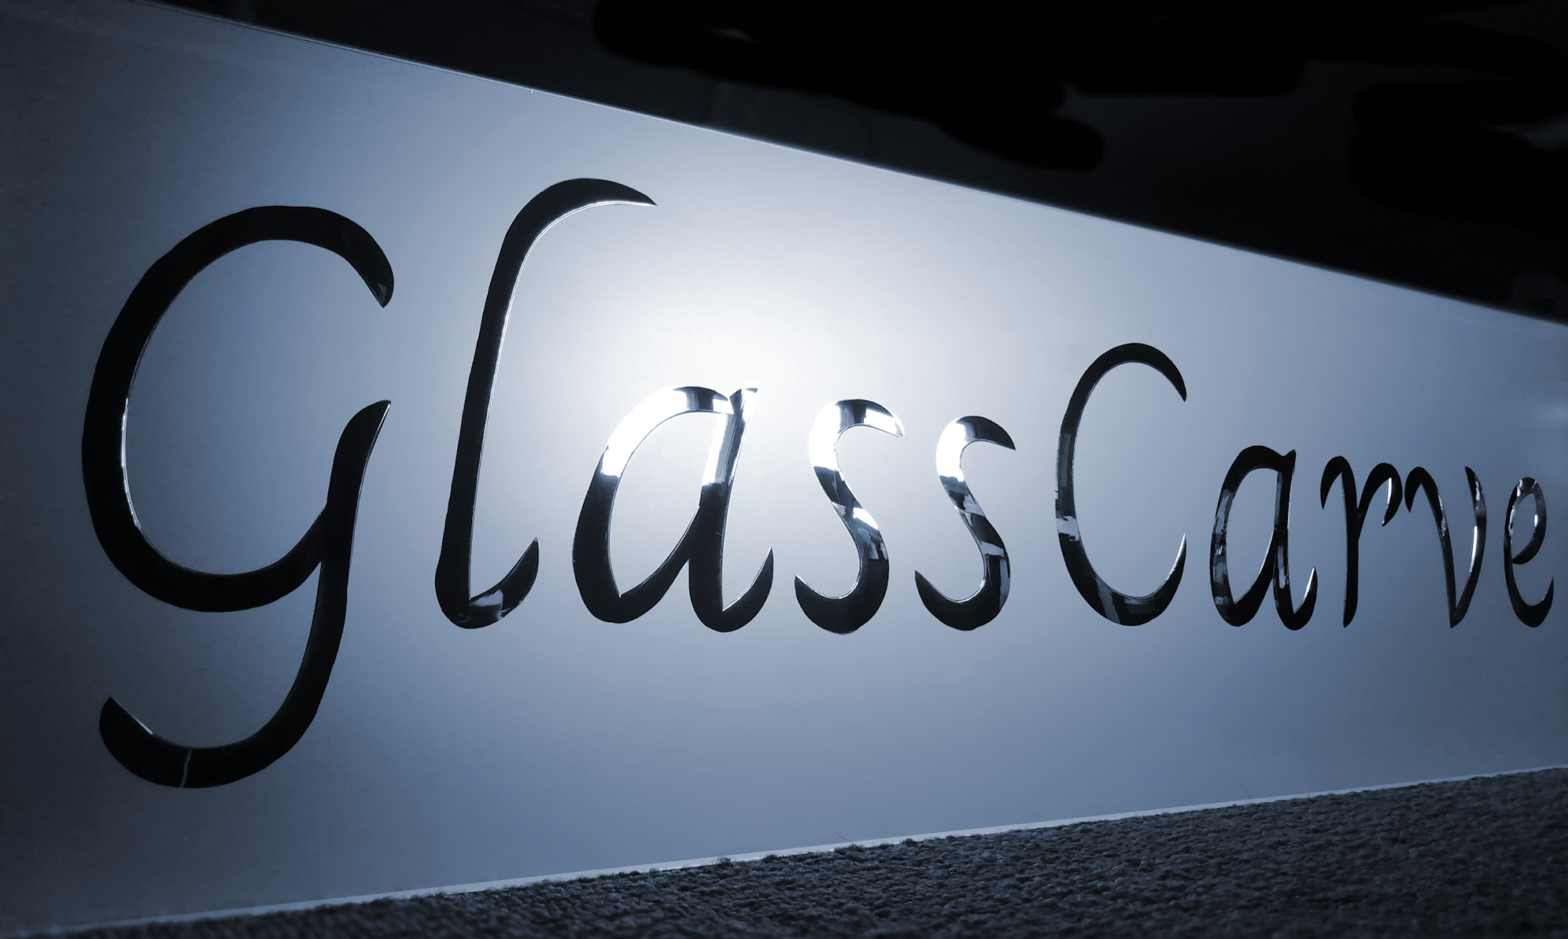 Glass Carve Co.